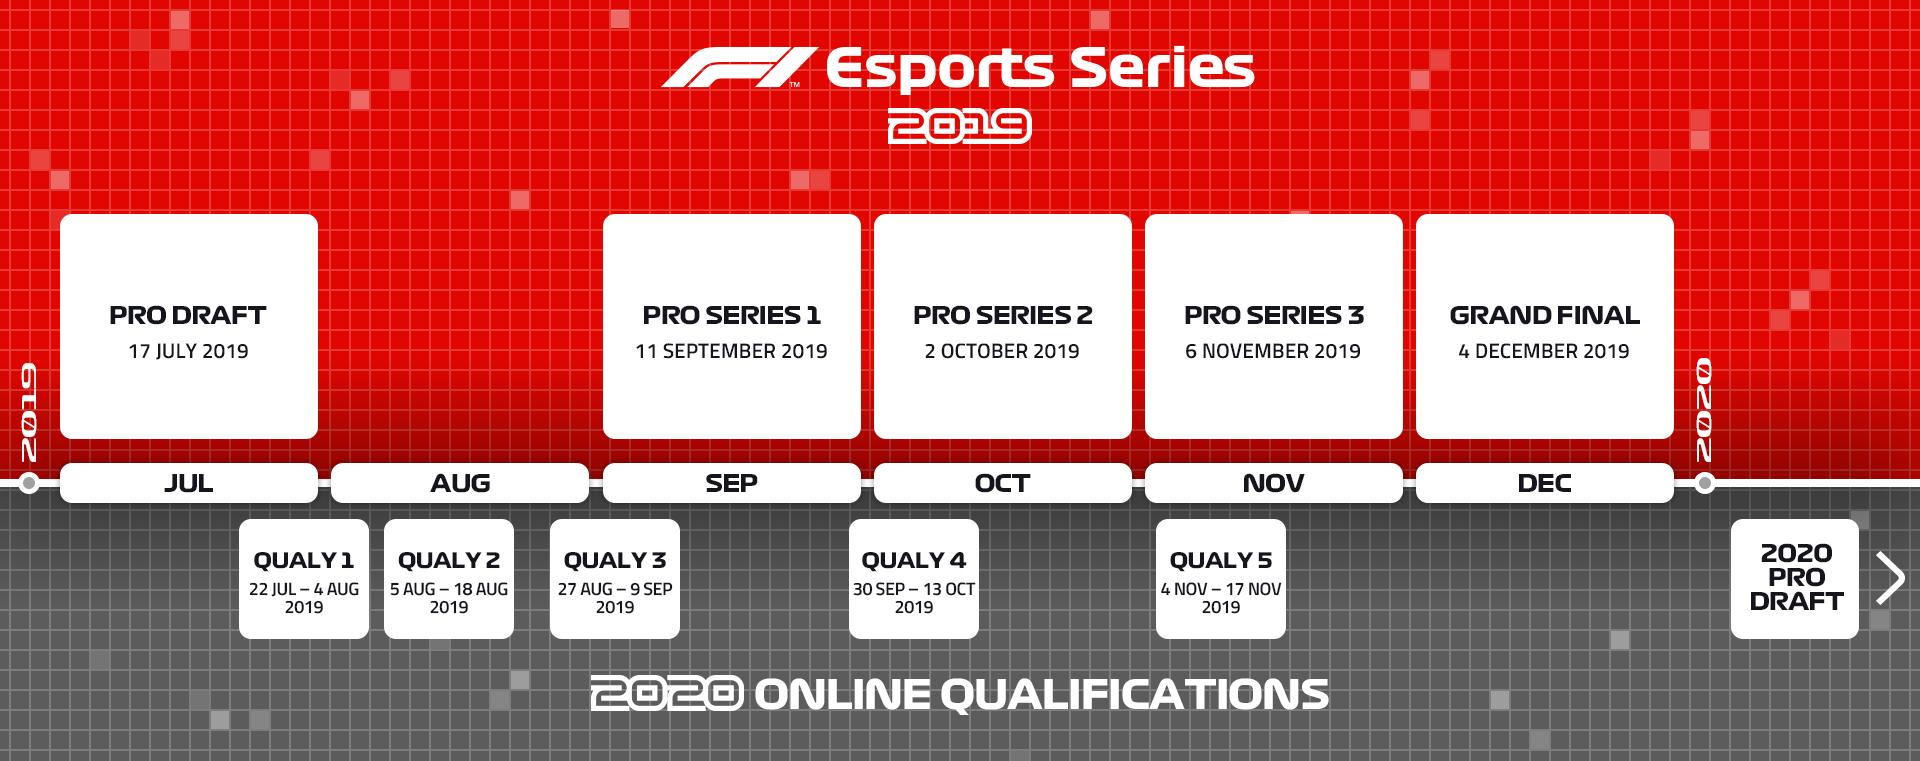 F1 Calendario 2020.Formula 1 Esports Series